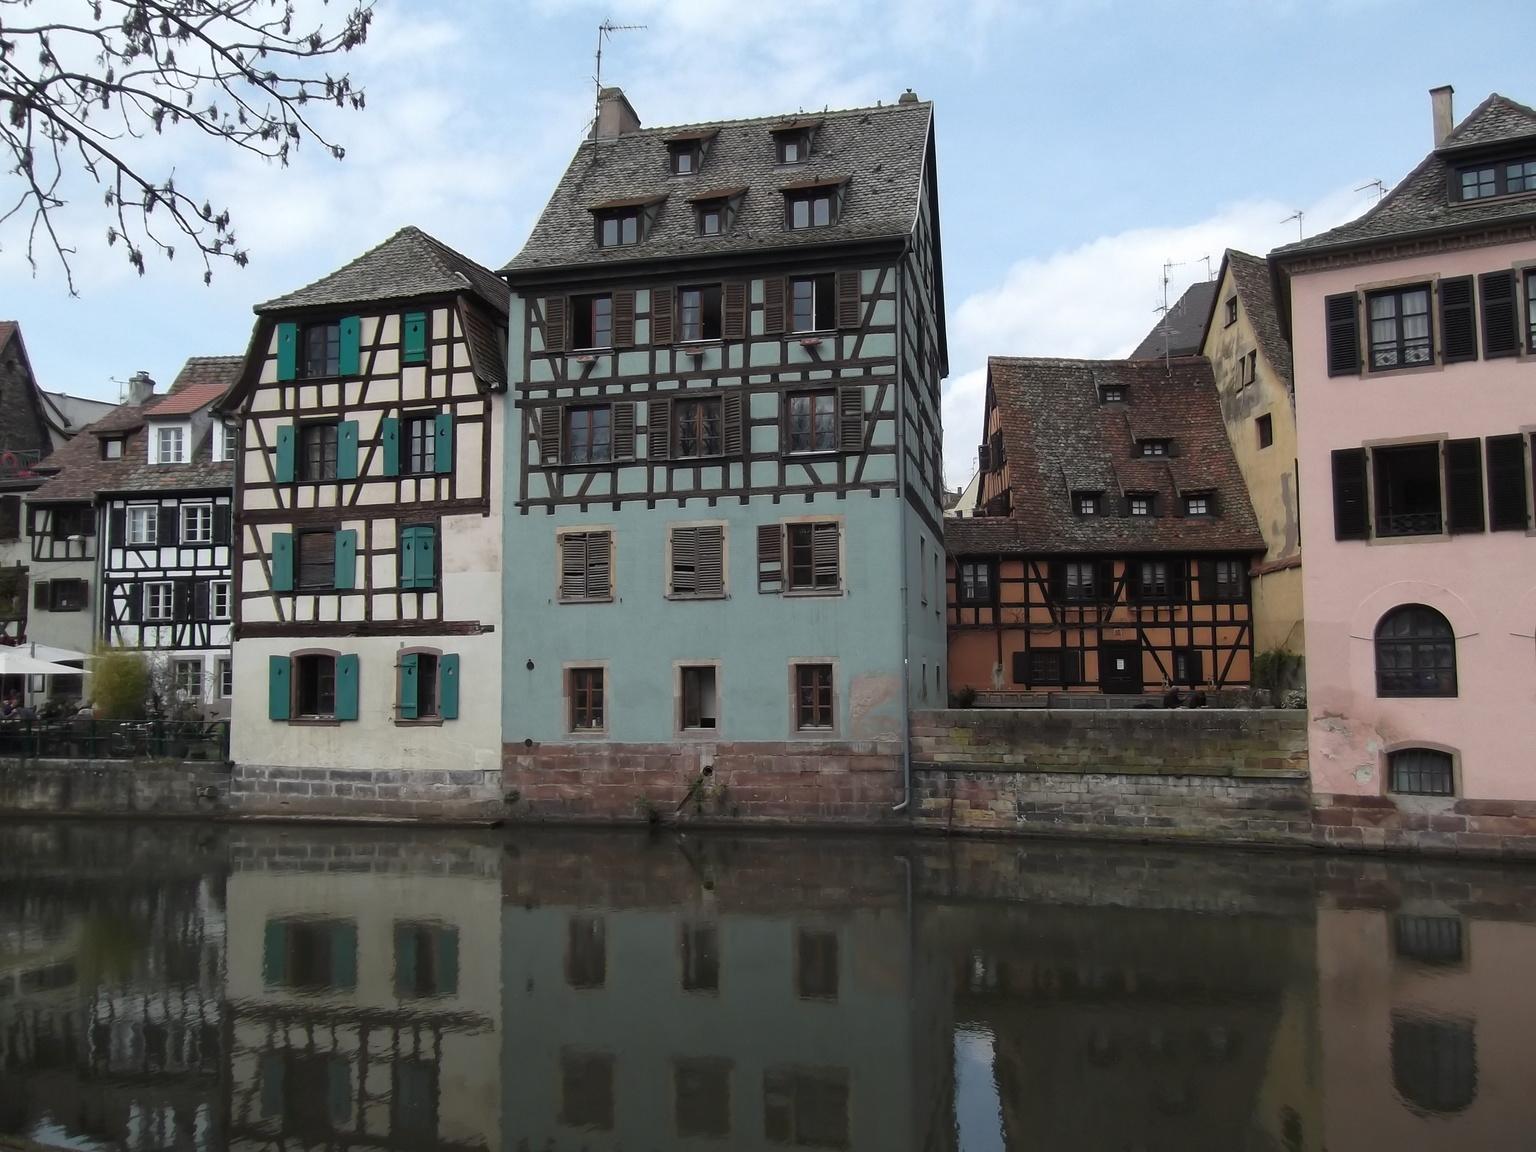 Maisons de Strasbourg » Résultats de recherche » leitersperger